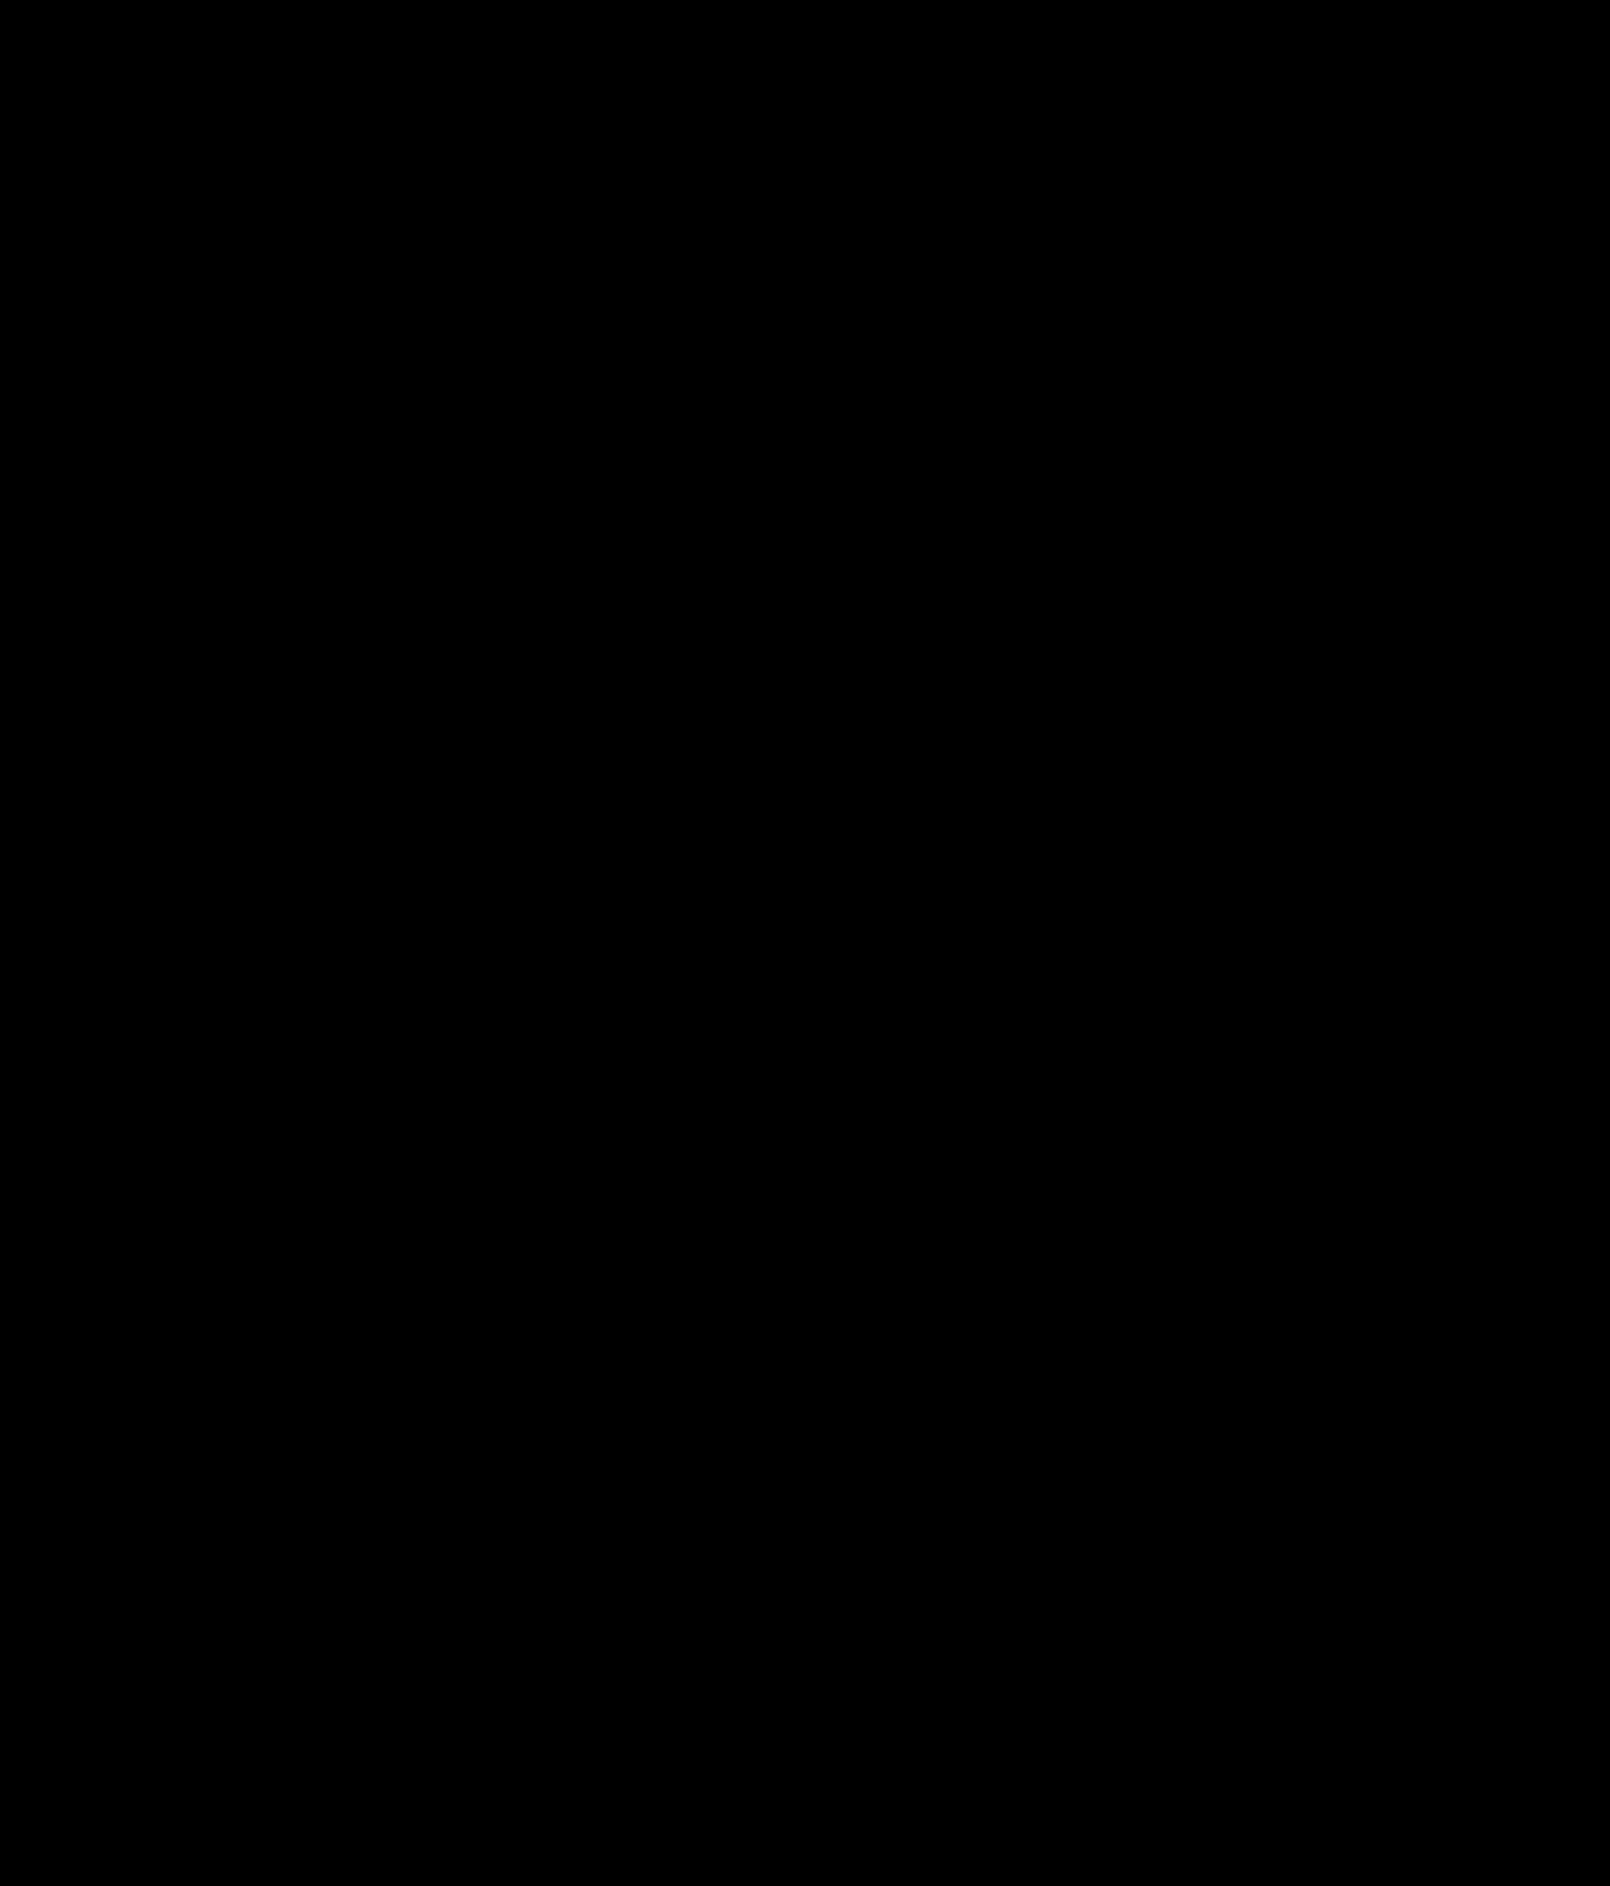 Image-four